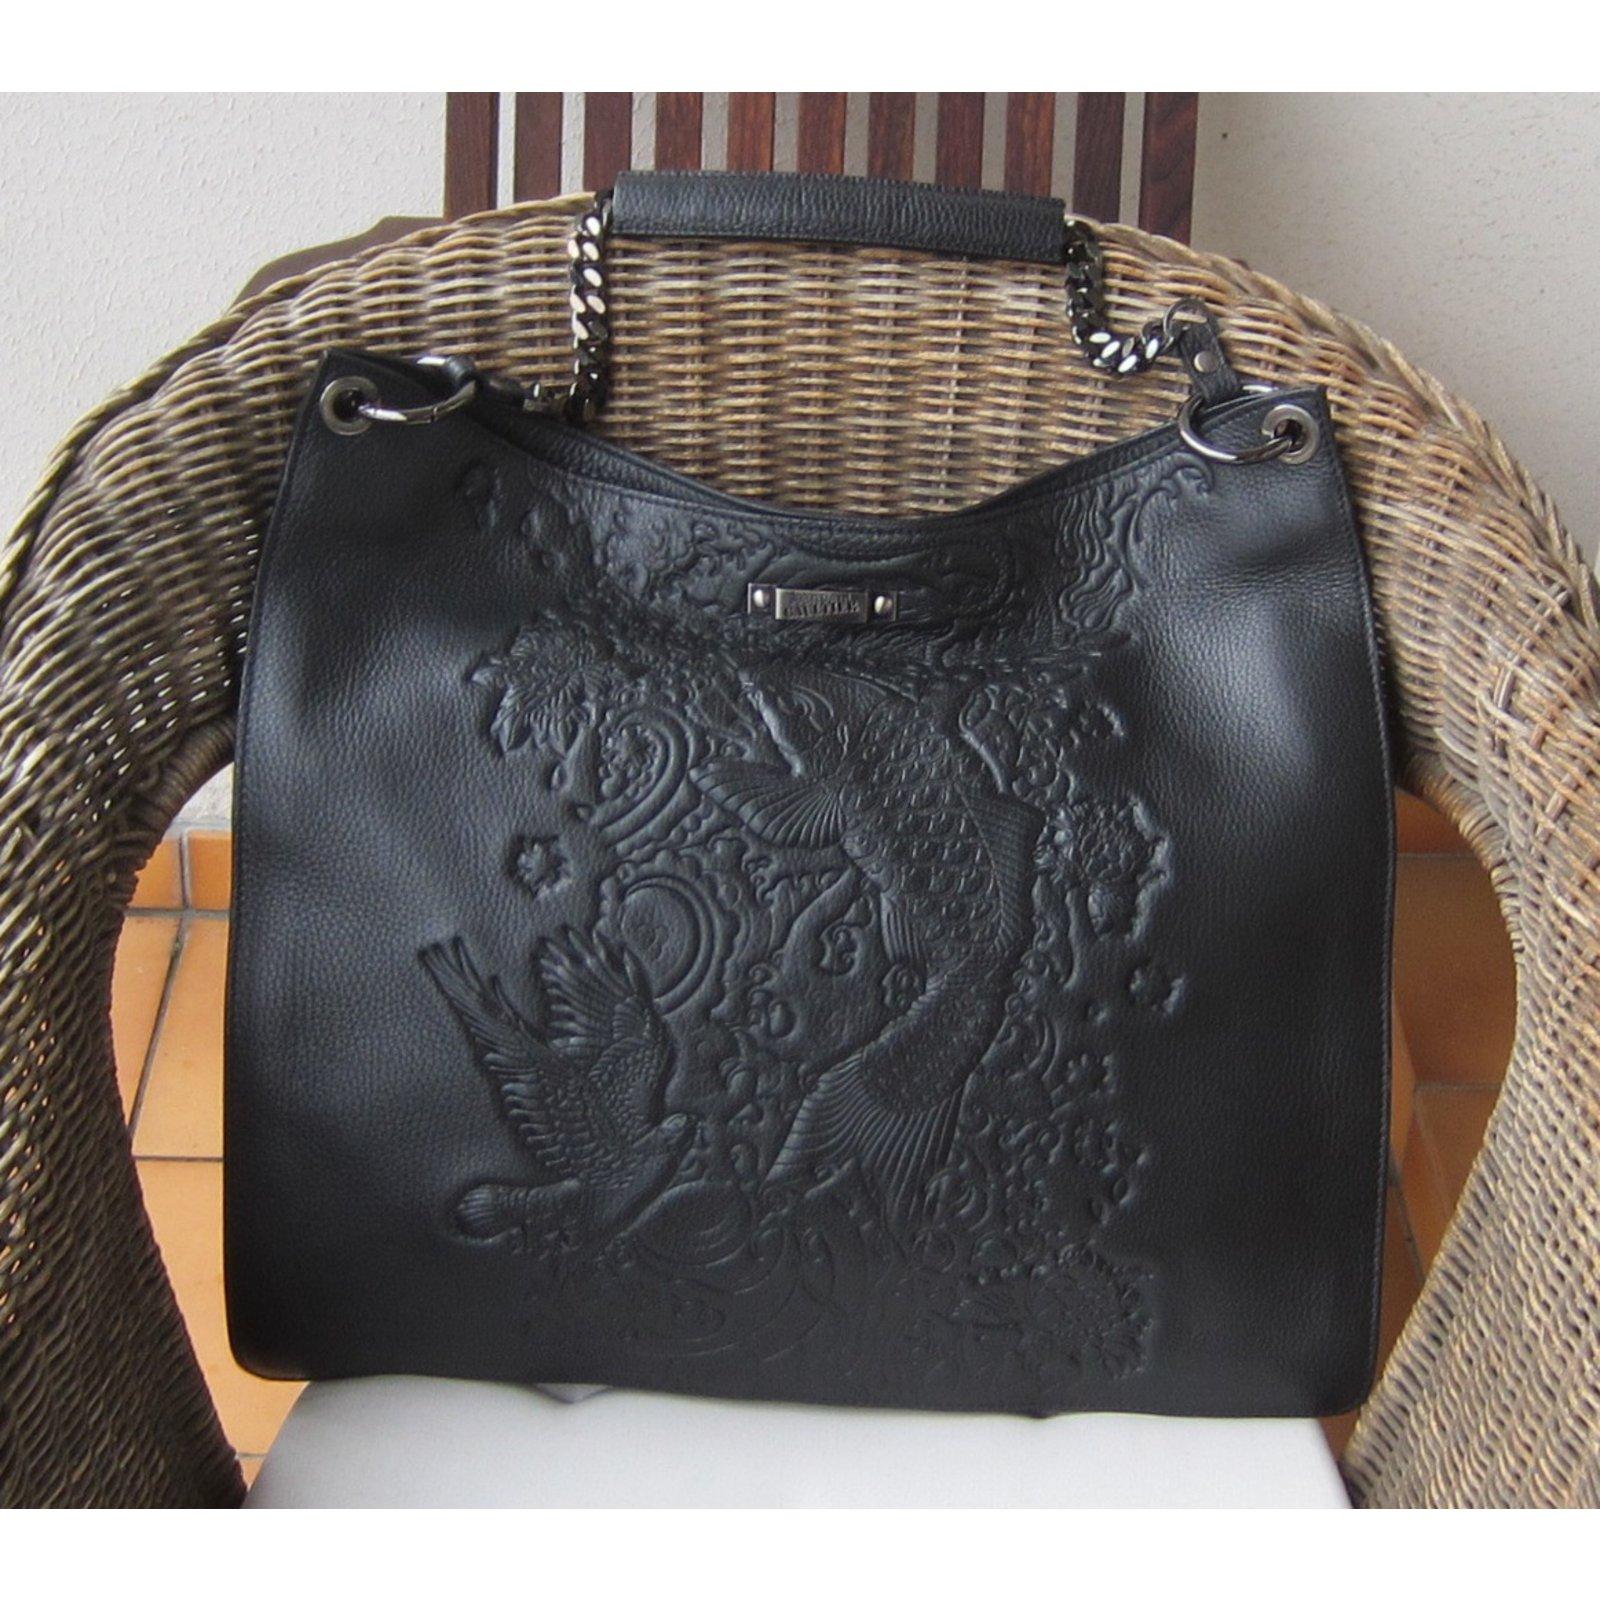 39f6b0074f Jean Paul Gaultier Handbags Handbags Leather Black ref.51631 - Joli Closet